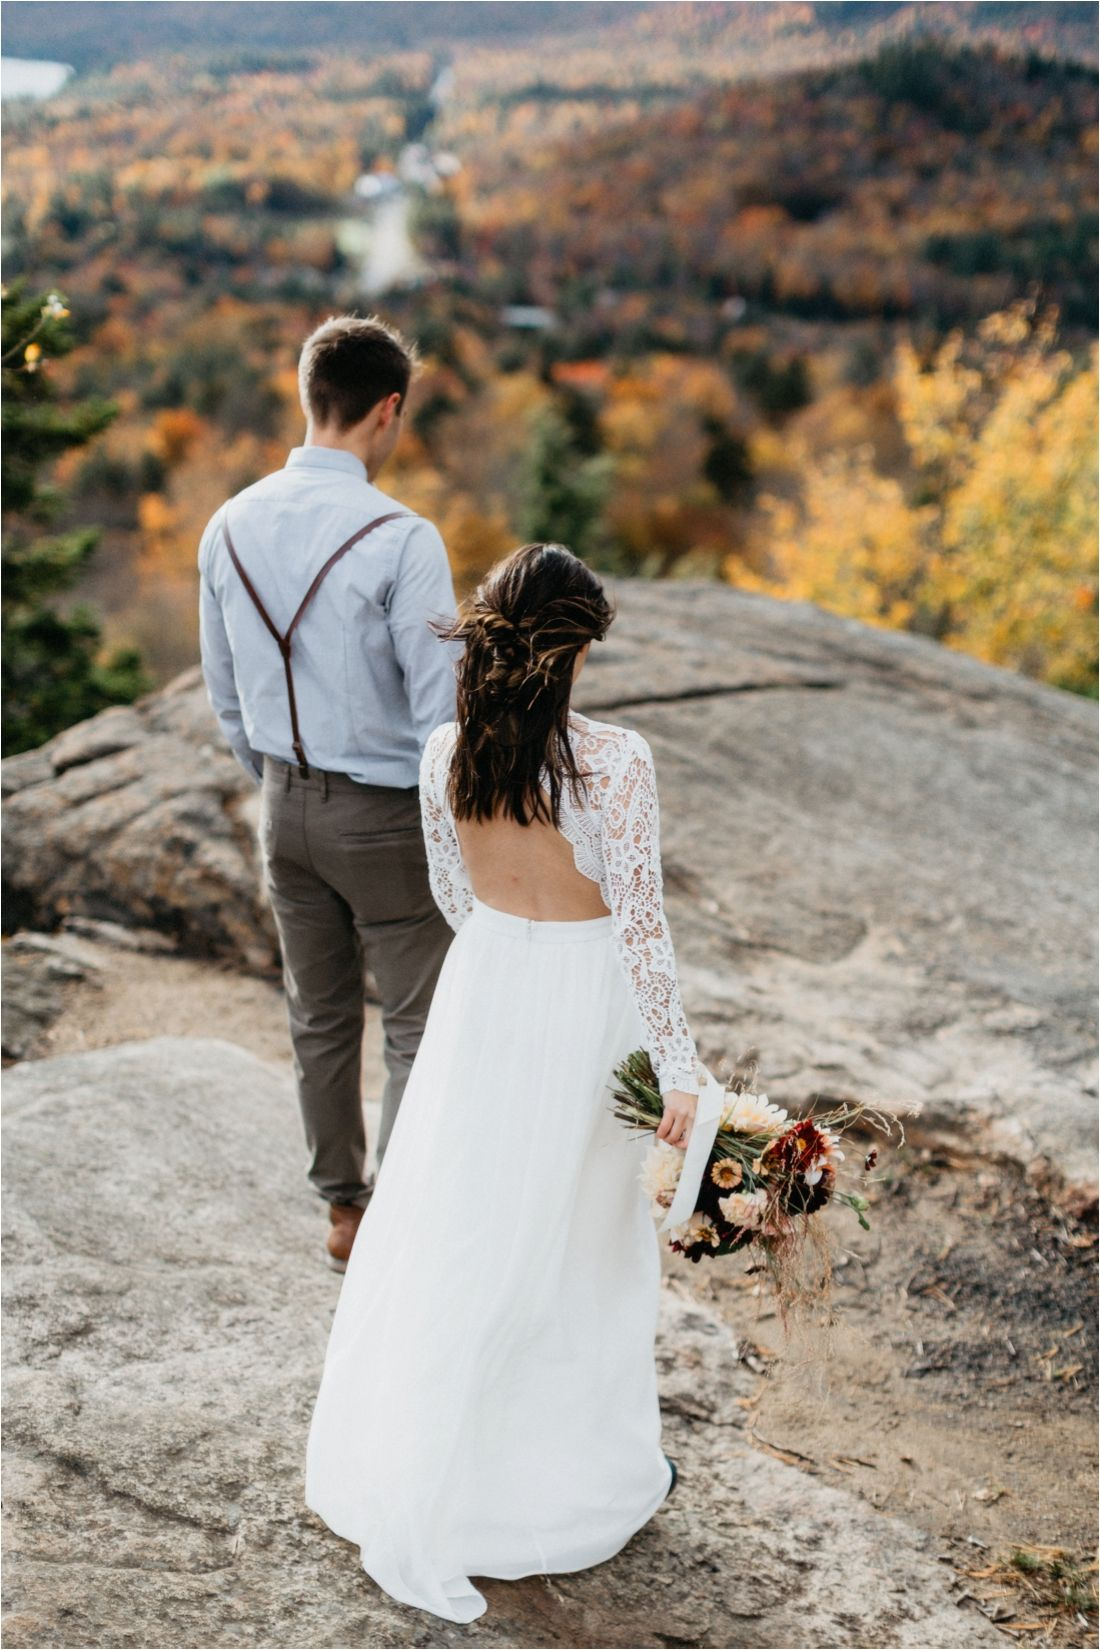 Fall Elopement on Rocky Mountain, Inlet, Adirondack